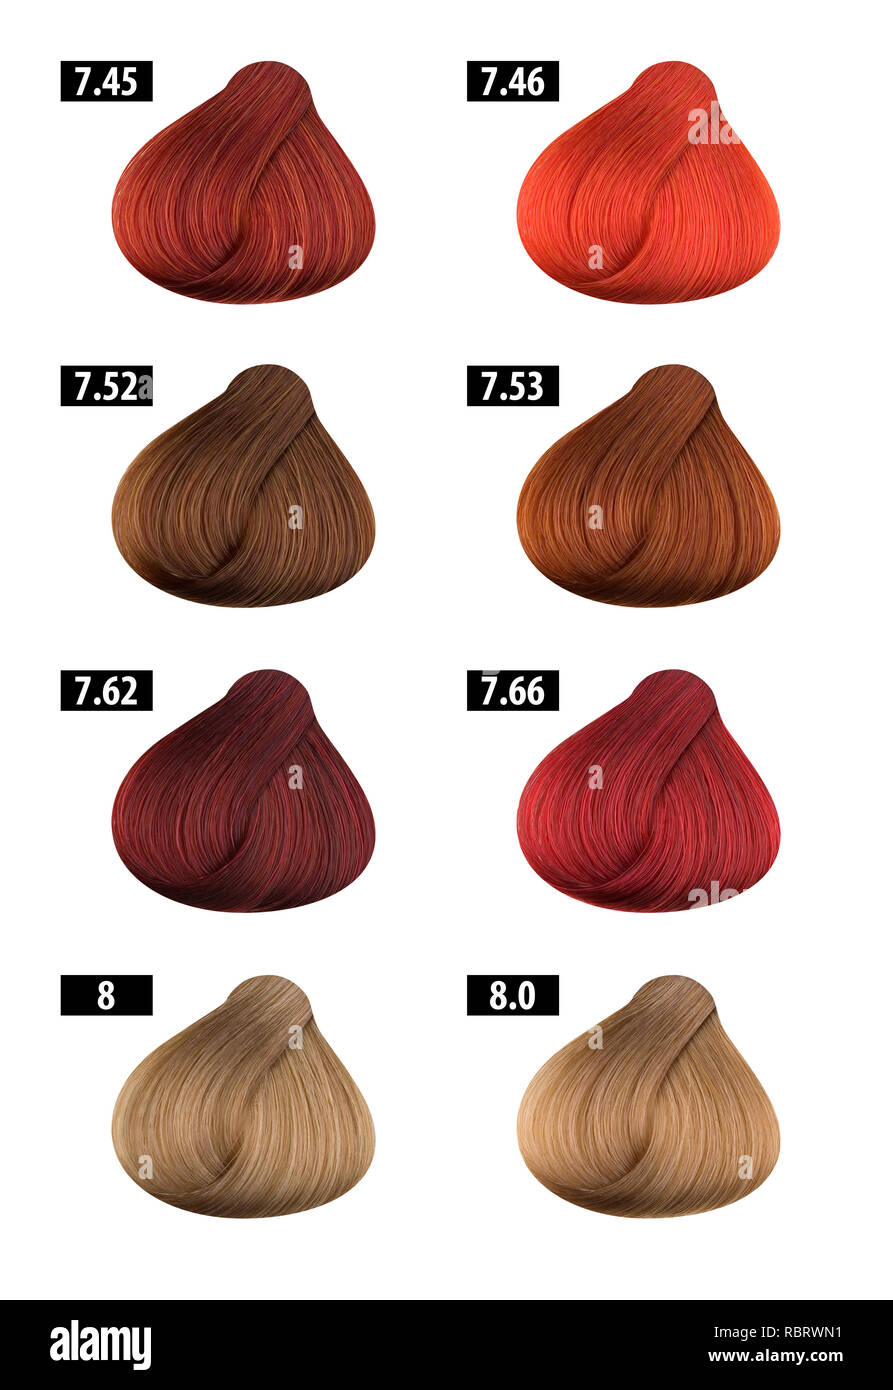 Loreal haarfarben zahlen